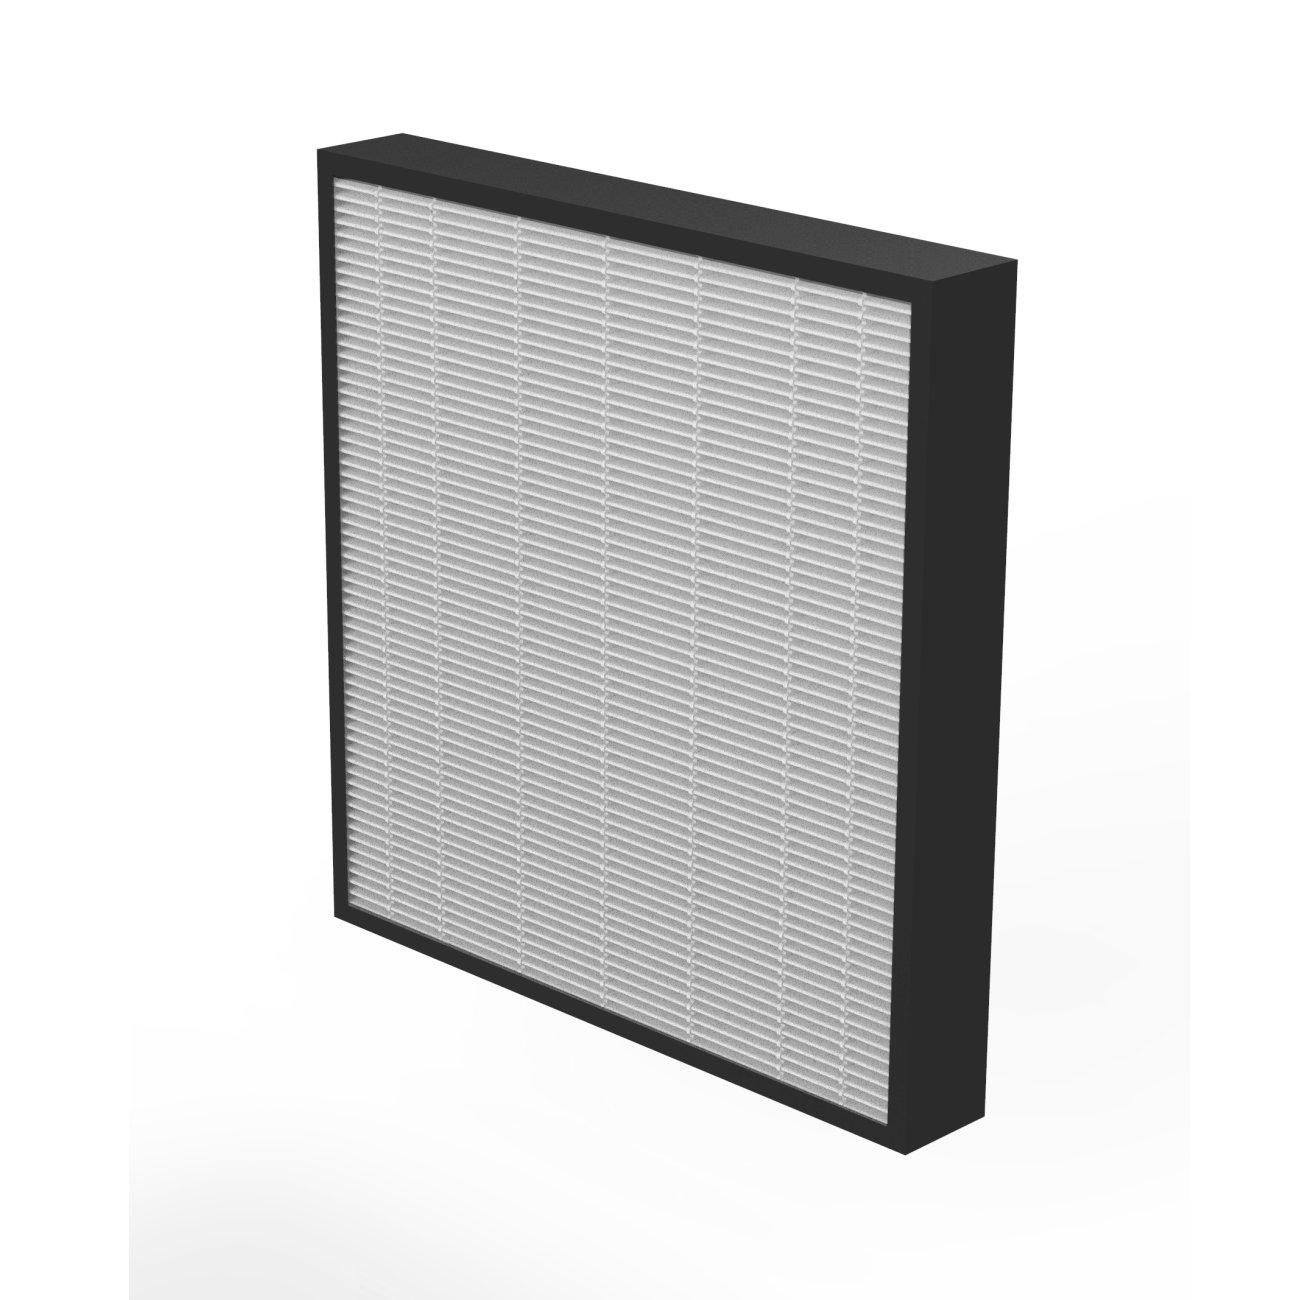 "AeraMaxPRO 2"" Hybrid Filter"